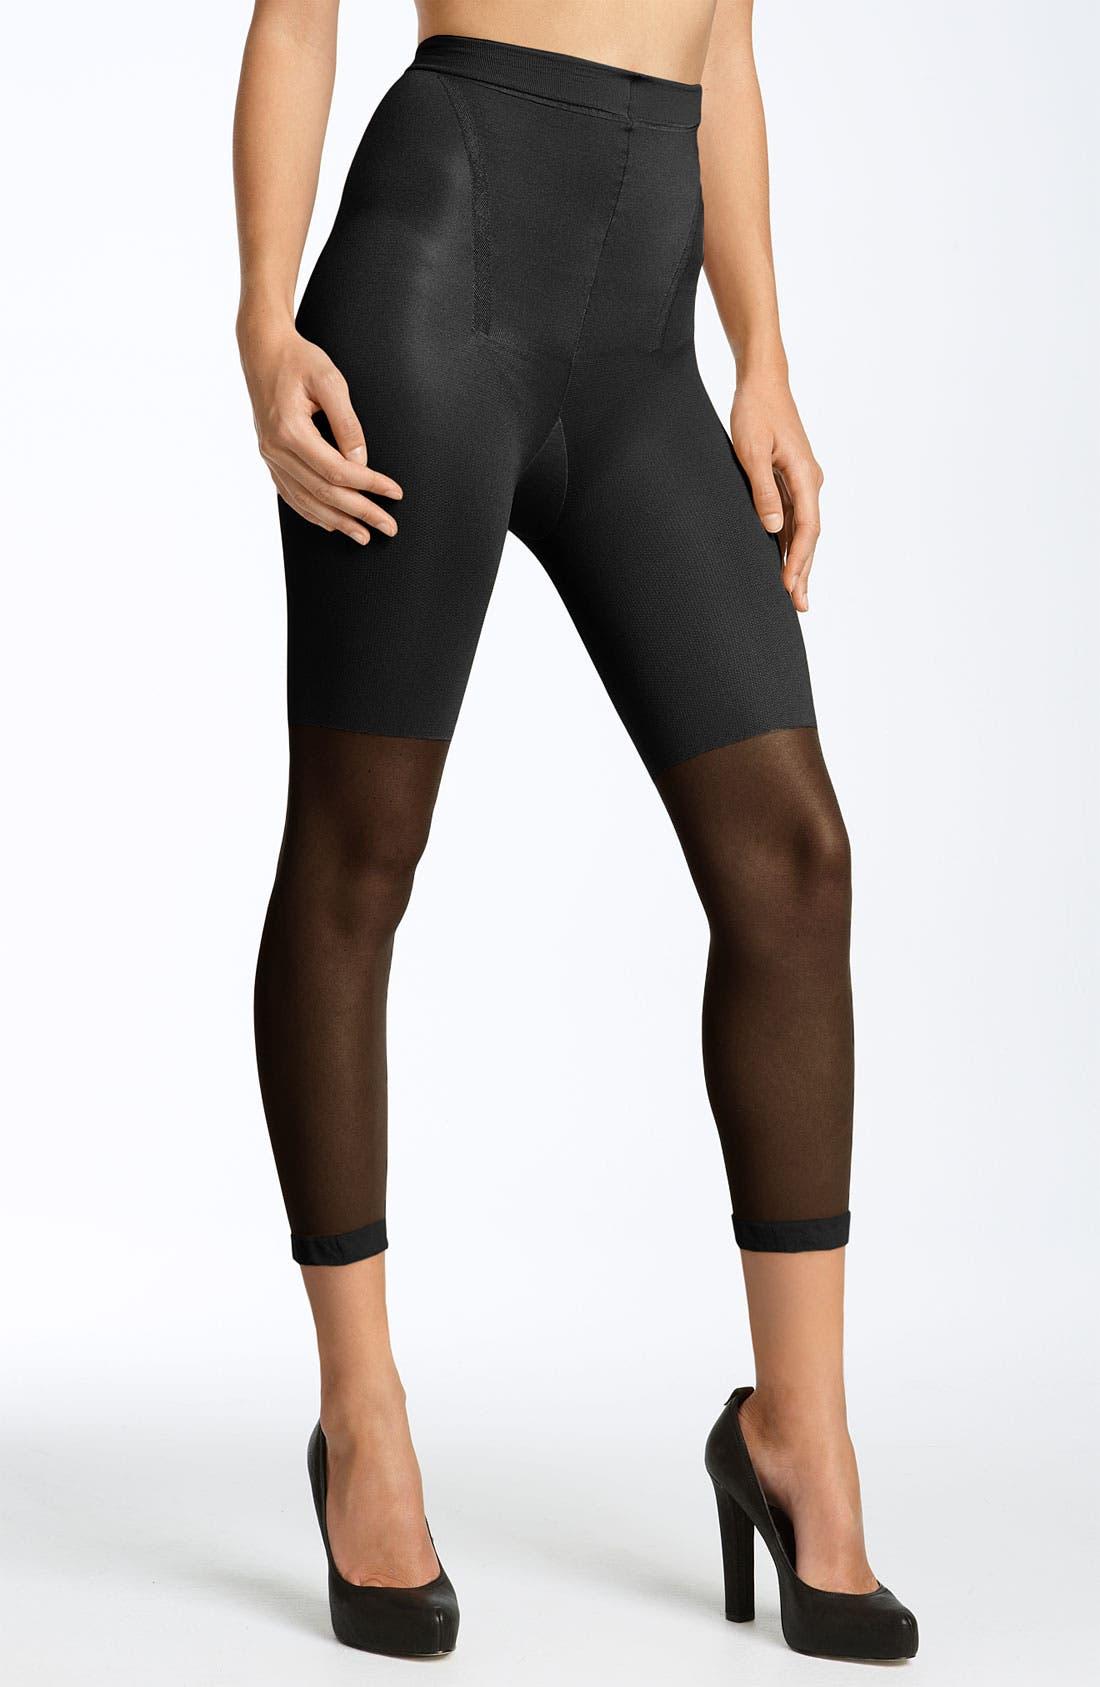 SPANX® Power Capri Control Top Footless Pantyhose (Regular & Plus Size)